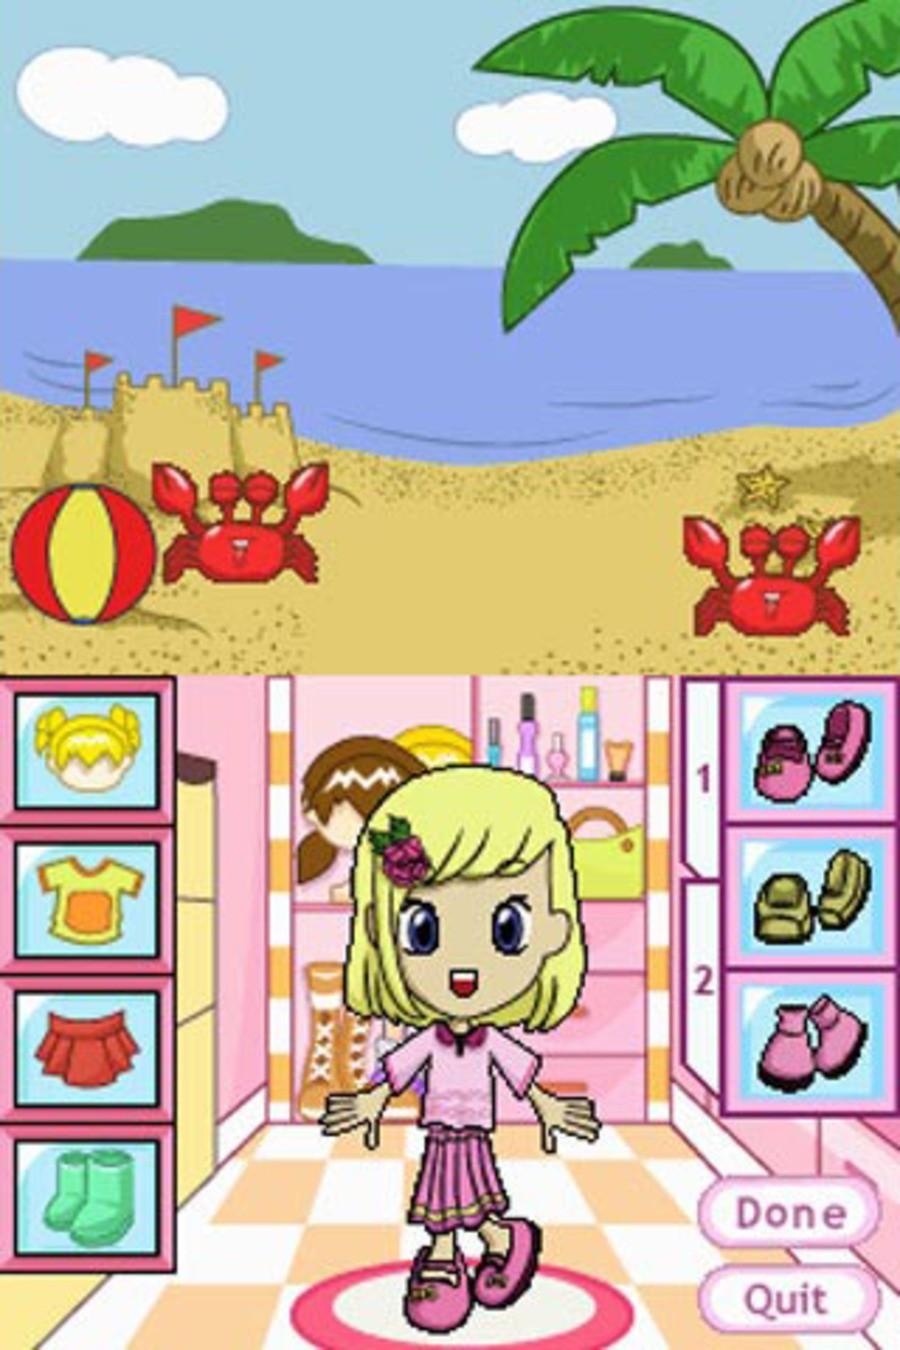 Smart Girl's Playhouse Mini Screenshot